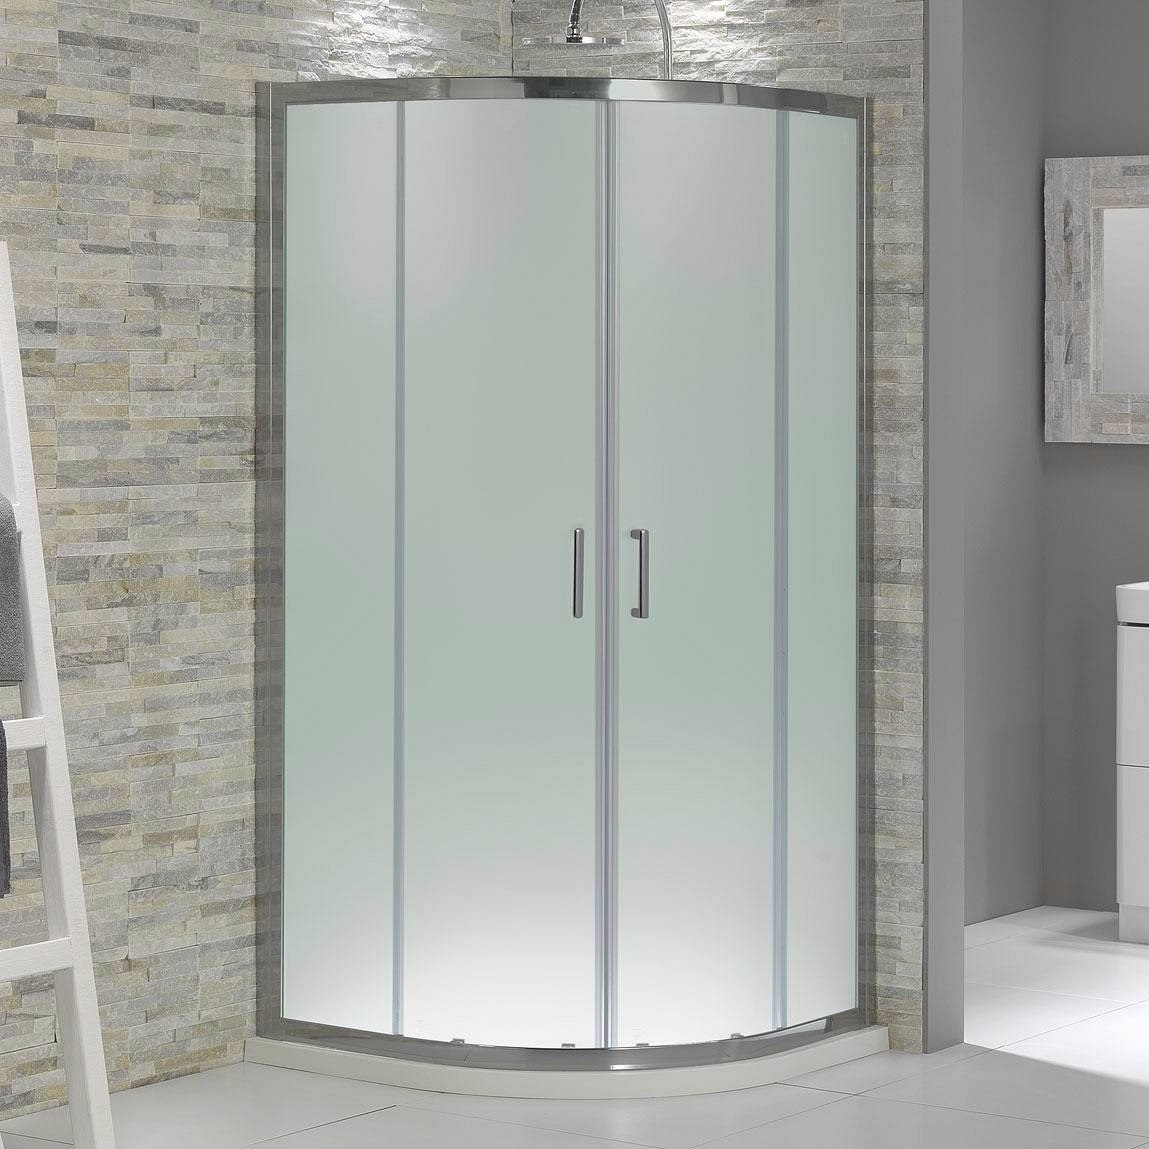 Cabina ducha rectangular cabina ducha rectangular - Cabina ducha rectangular ...